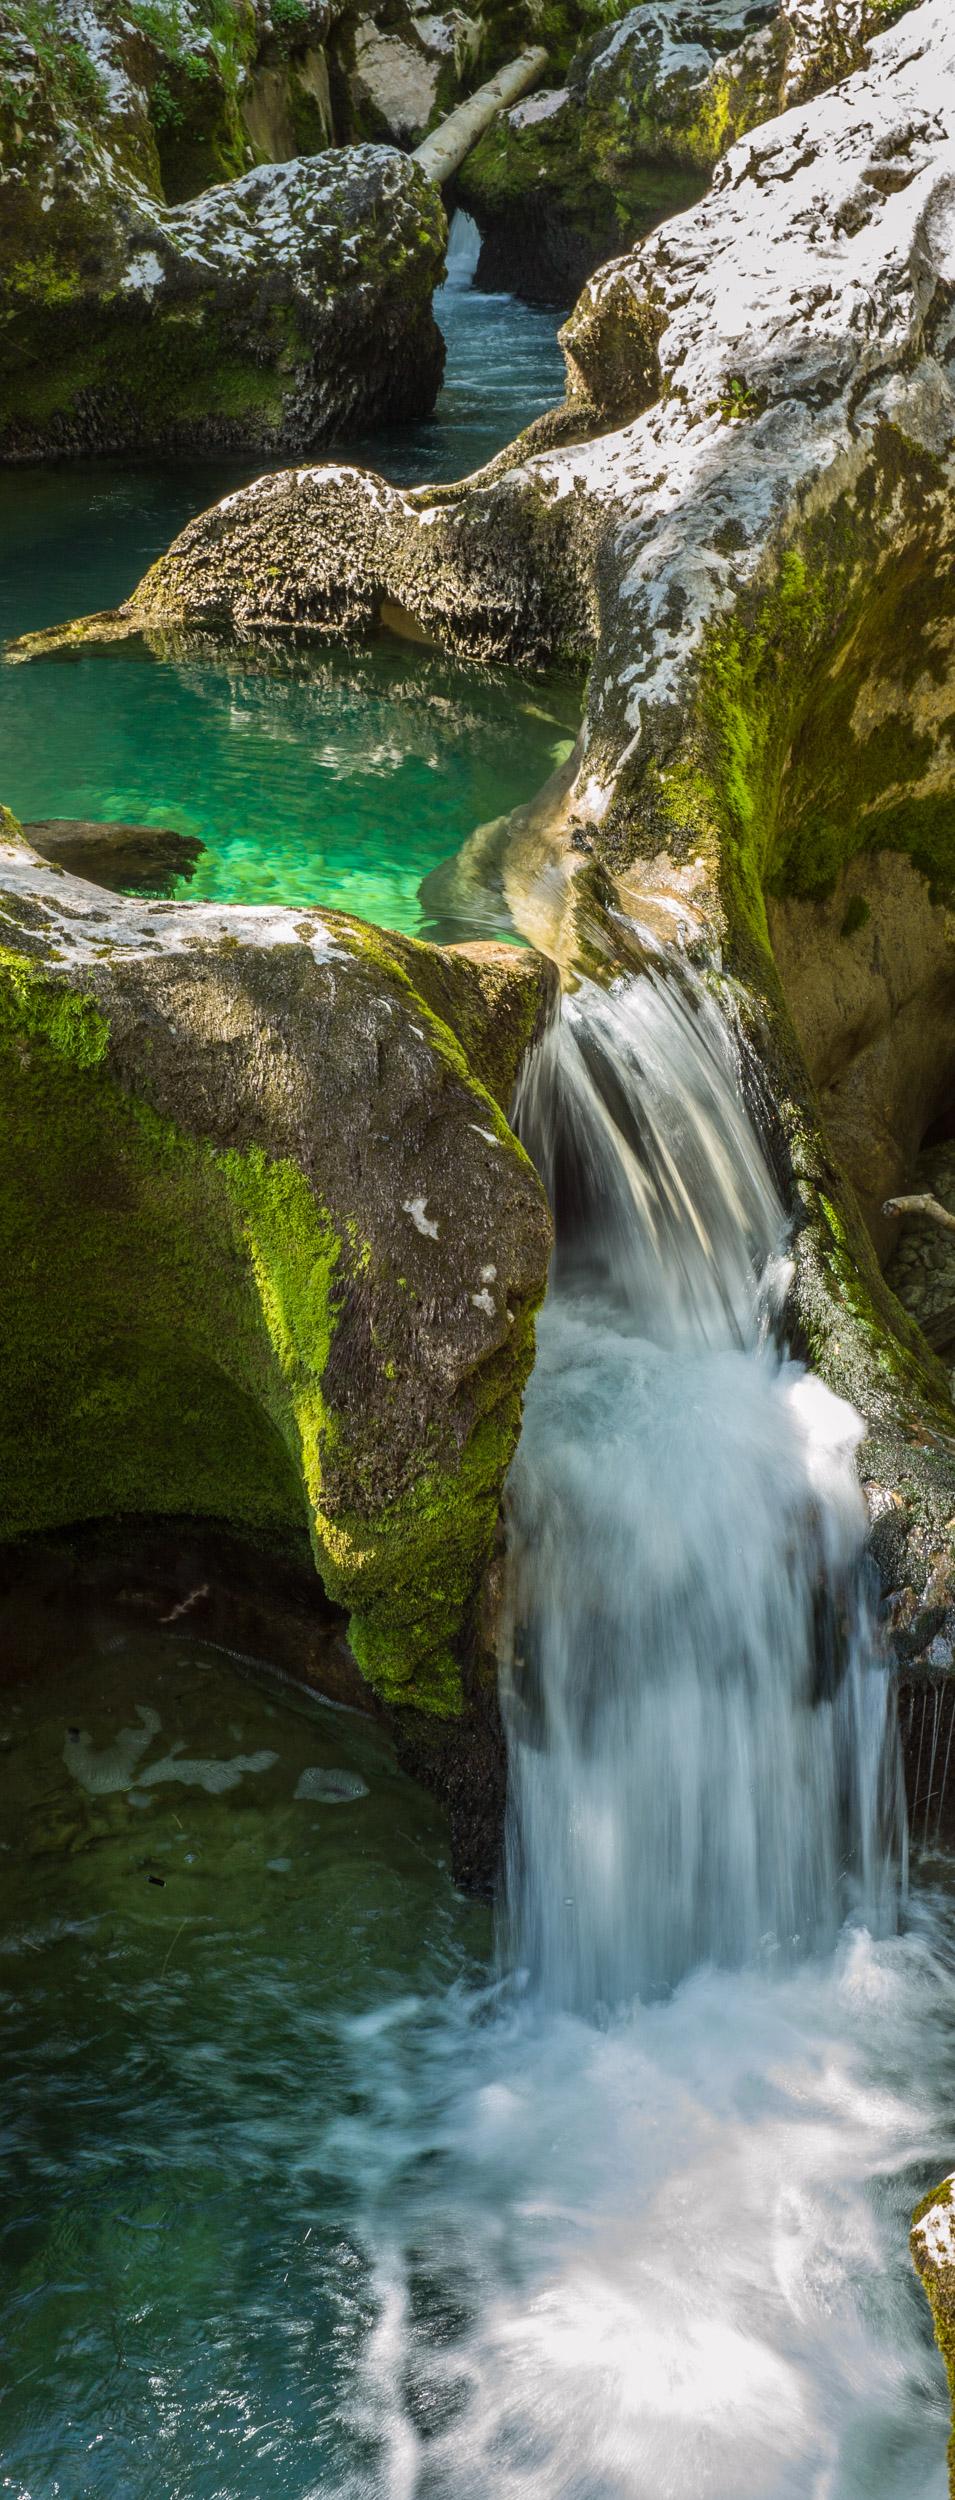 Waterfall in the Voje valley Triglavski National Park, Slovenia.